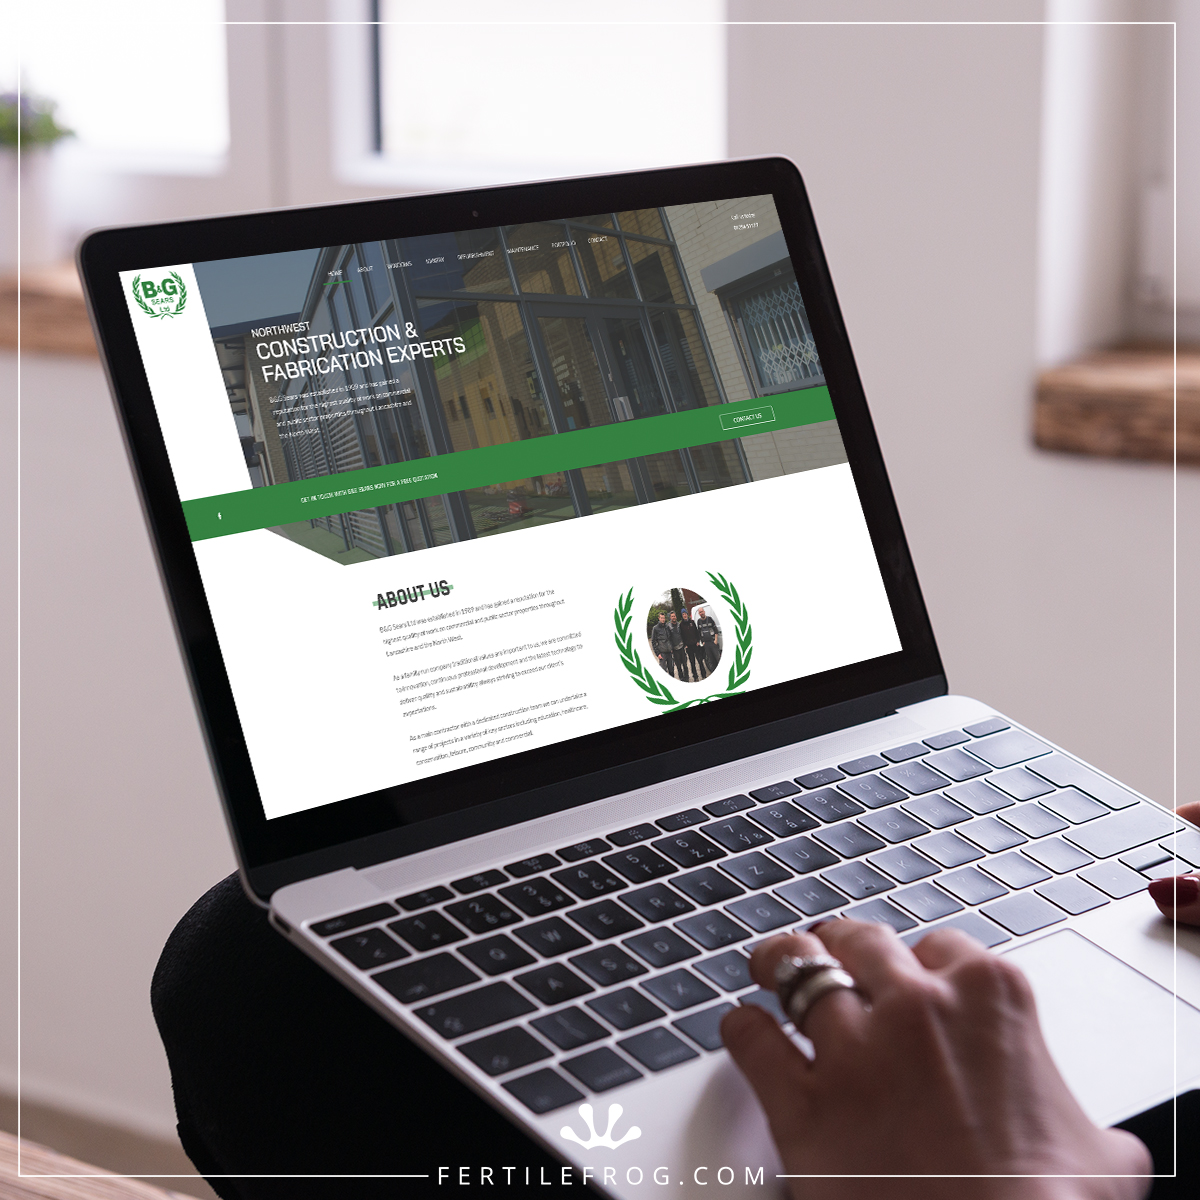 Construction Website - B&G Sears on Laptop